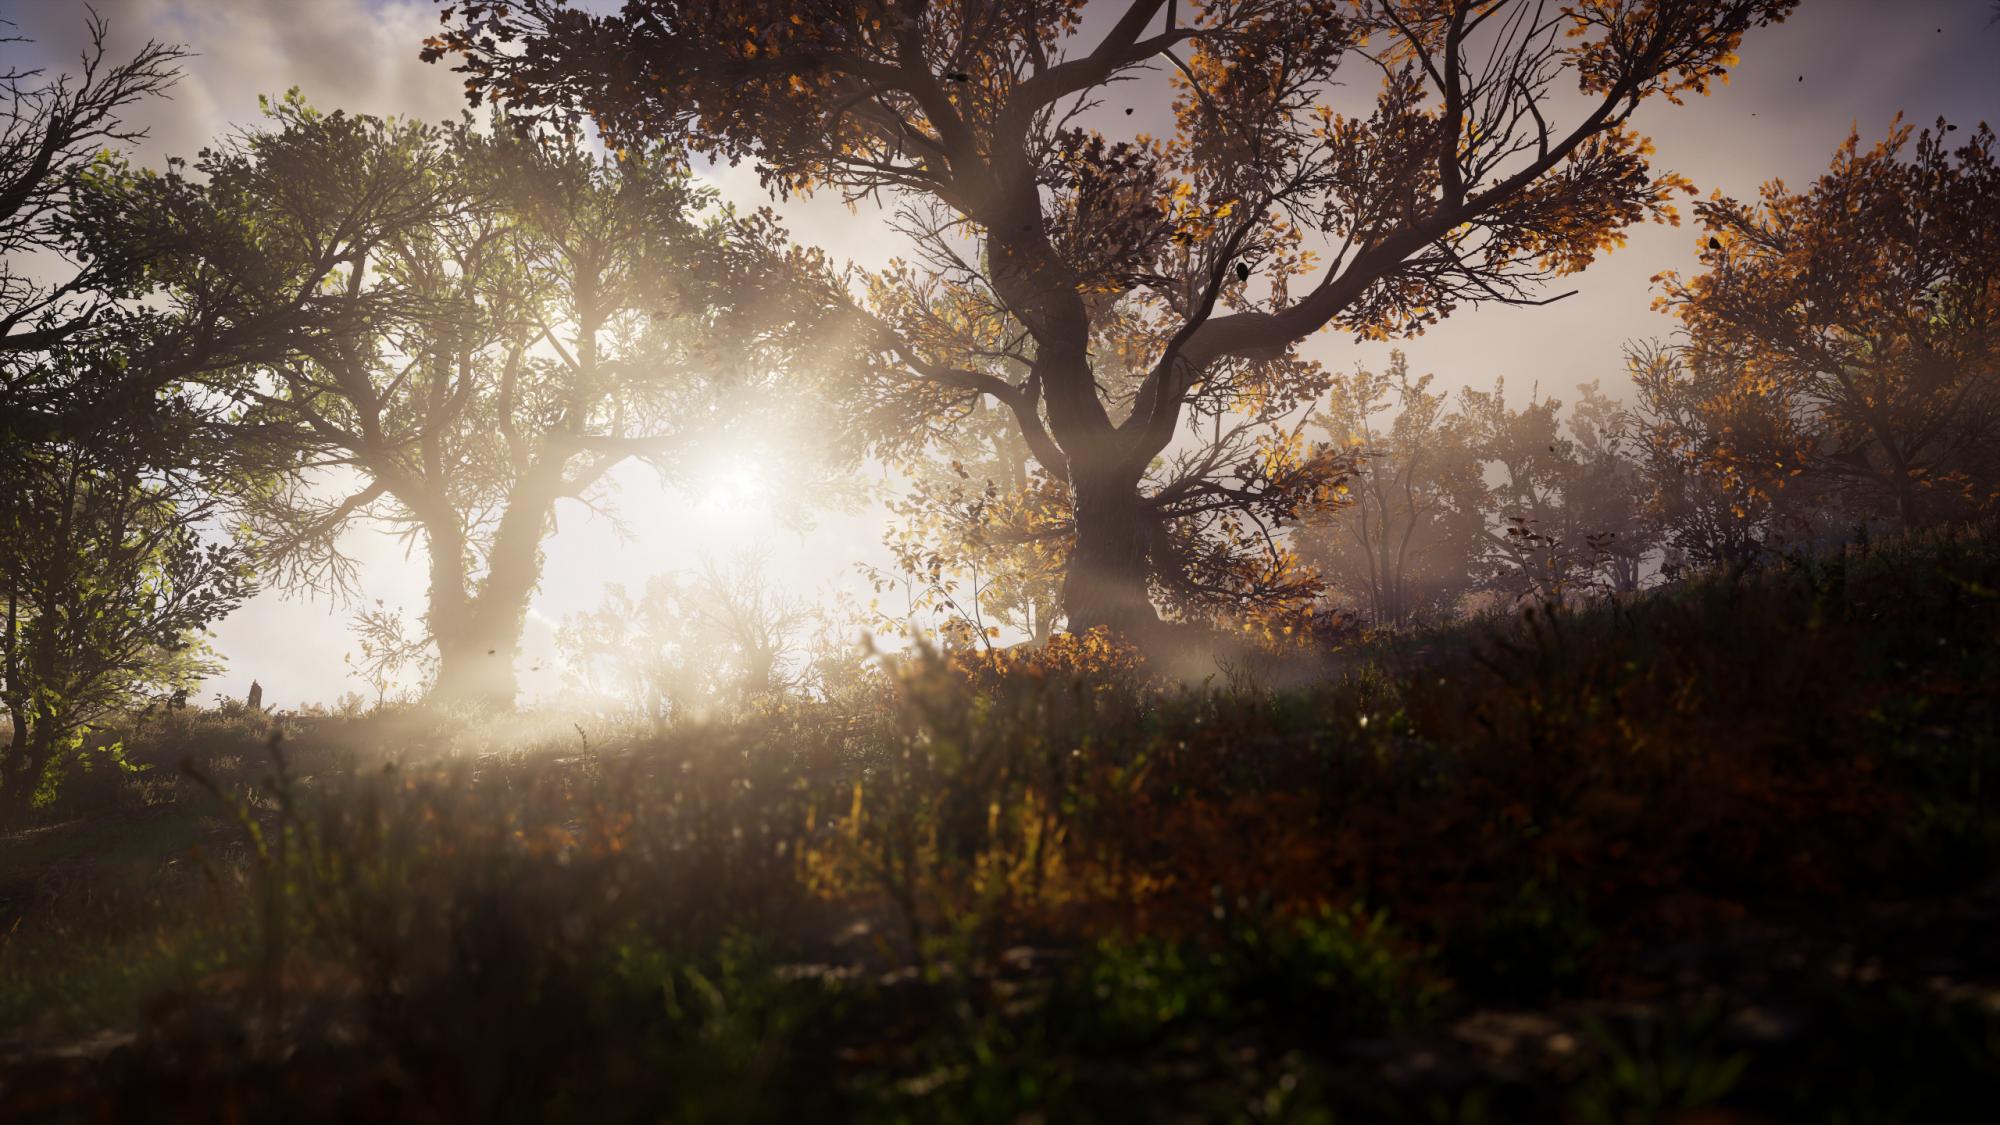 Assassin's Creed Valhalla Screenshot 2020.11.19 - 01.28.27.31.png